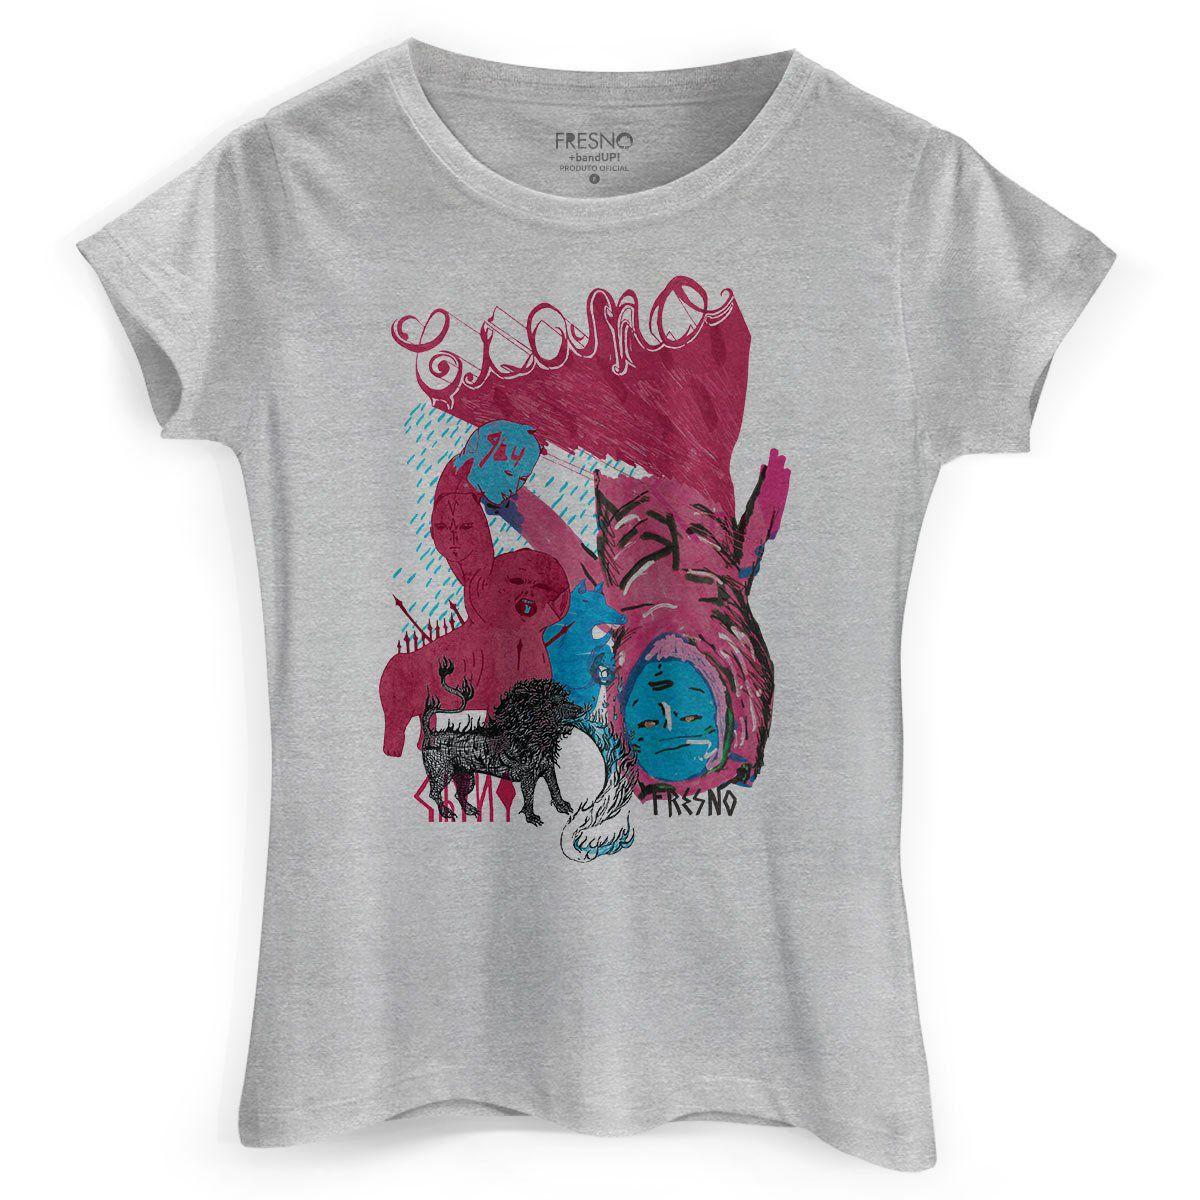 Camiseta Feminina Fresno Ciano Enxergar